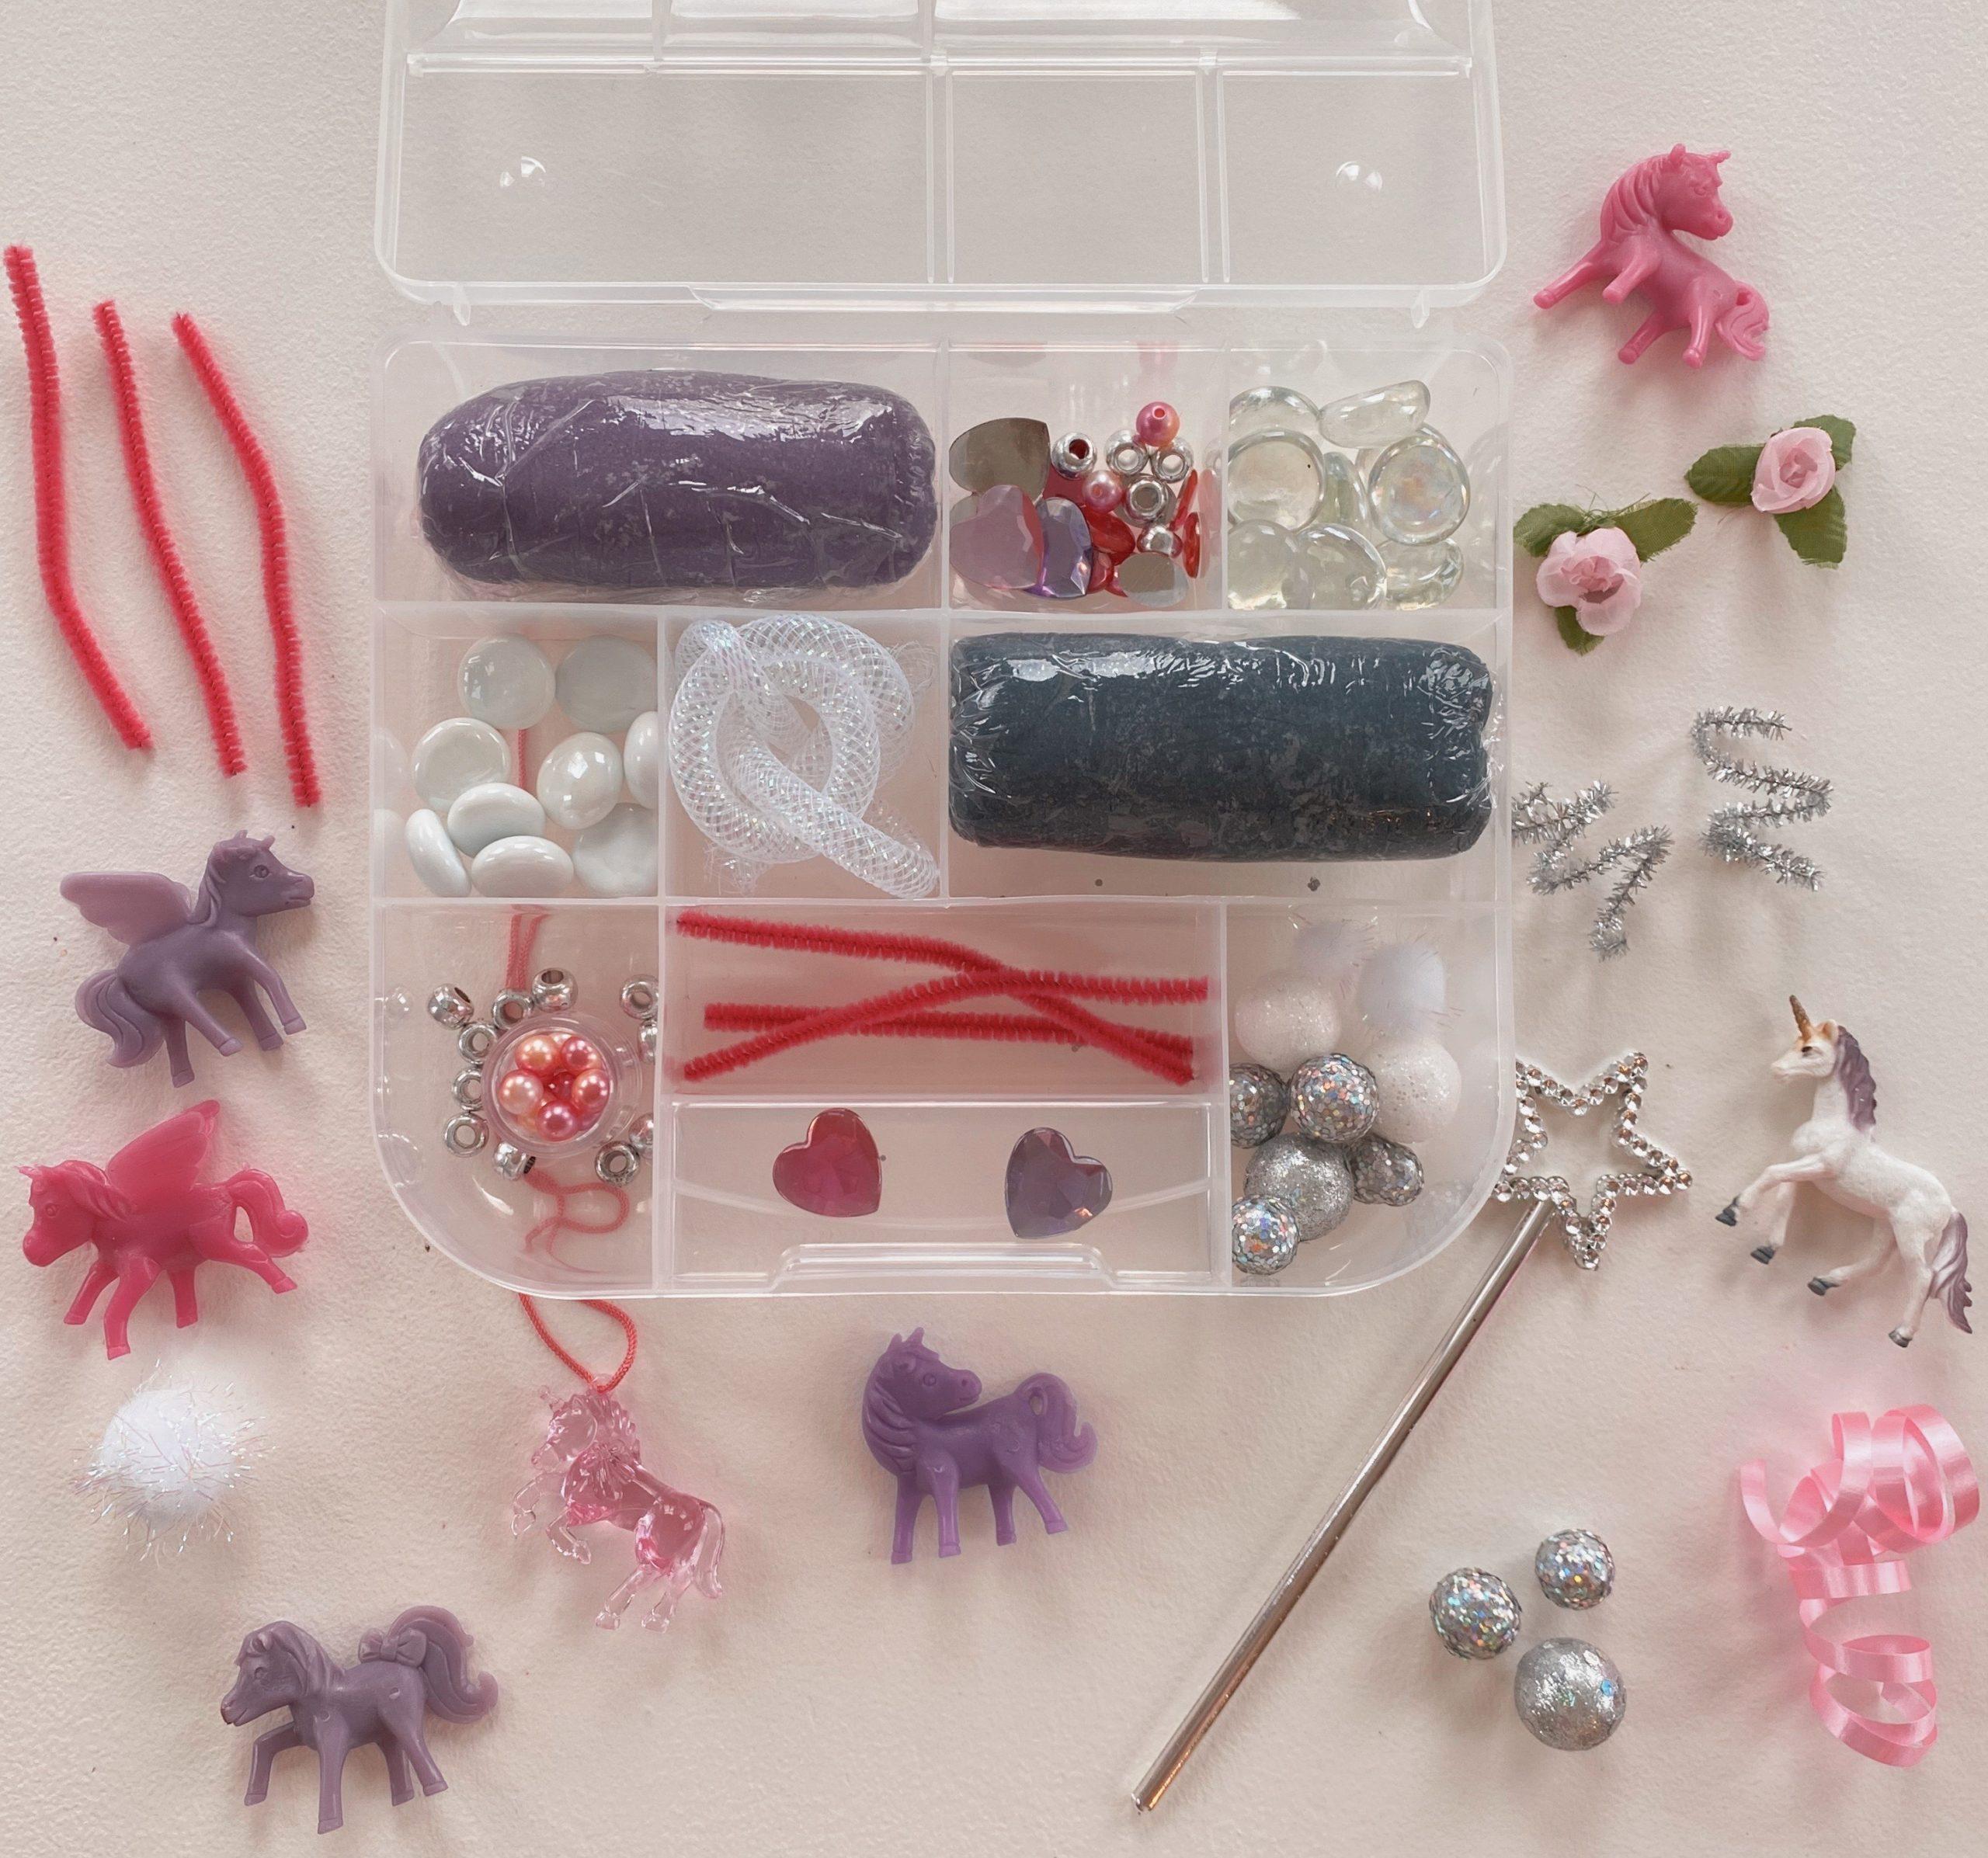 A Magical Minute sensory crafting kits